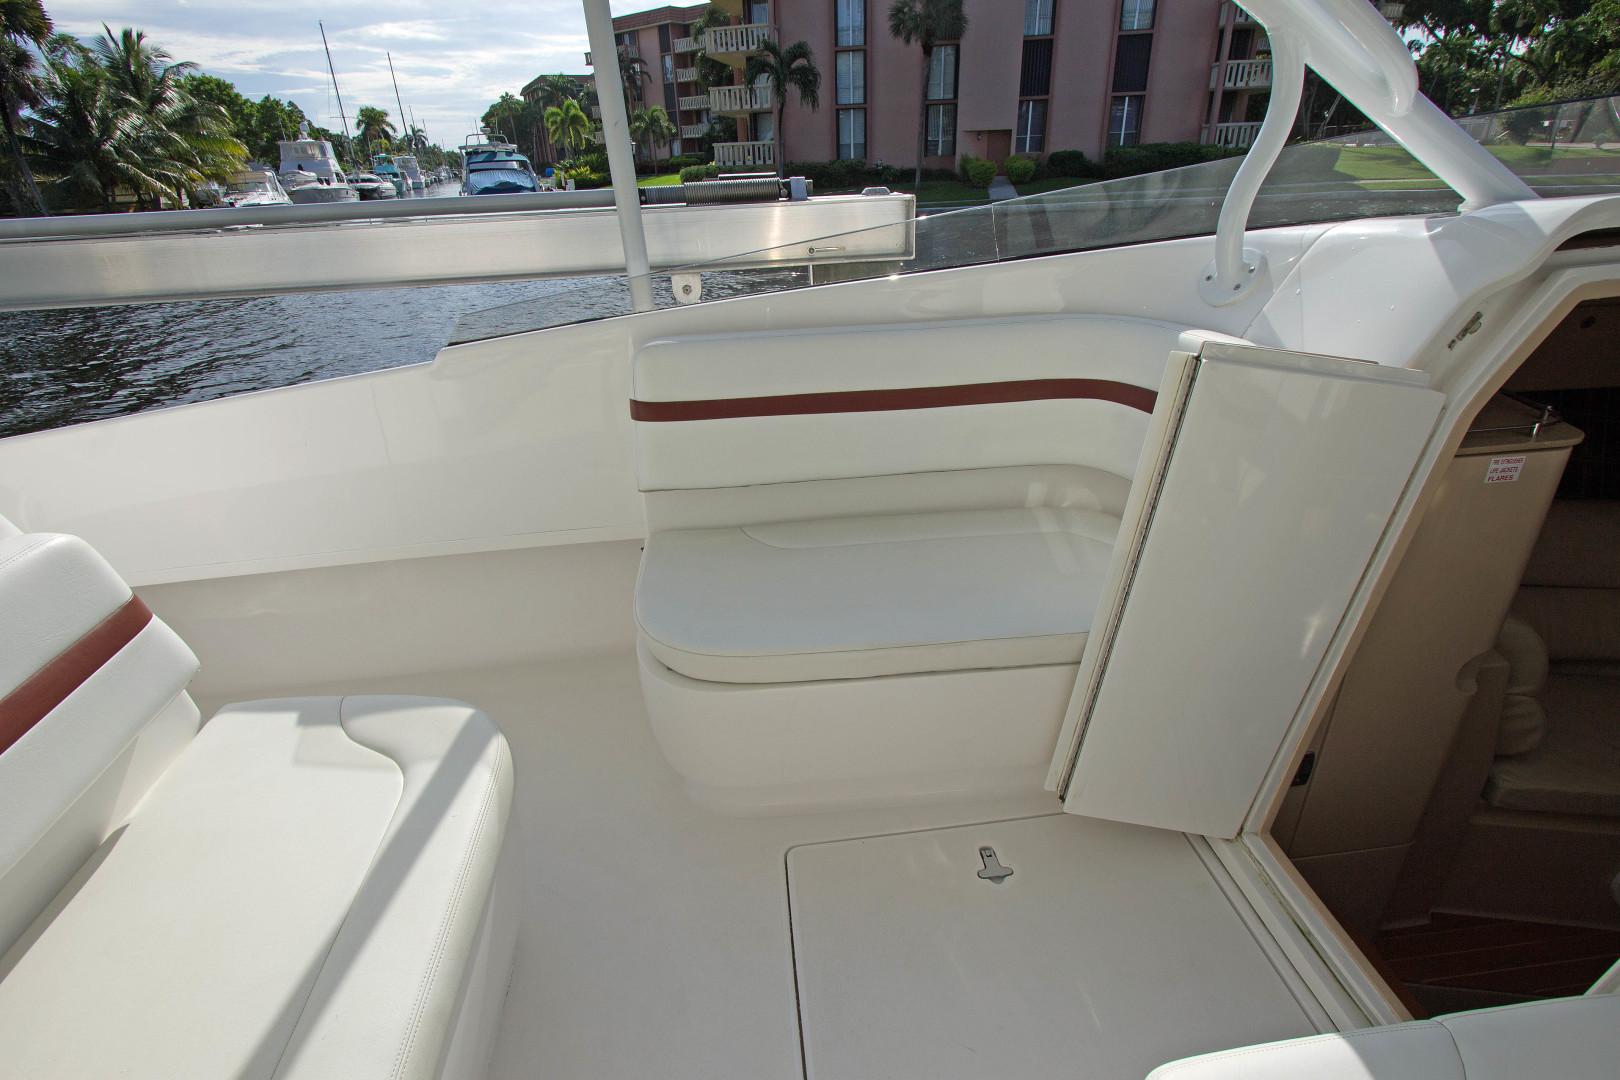 Intrepid-375 Walkaround 2014-NN 375 Walkaround 2014 Fort Lauderdale-Florida-United States-1507857 | Thumbnail